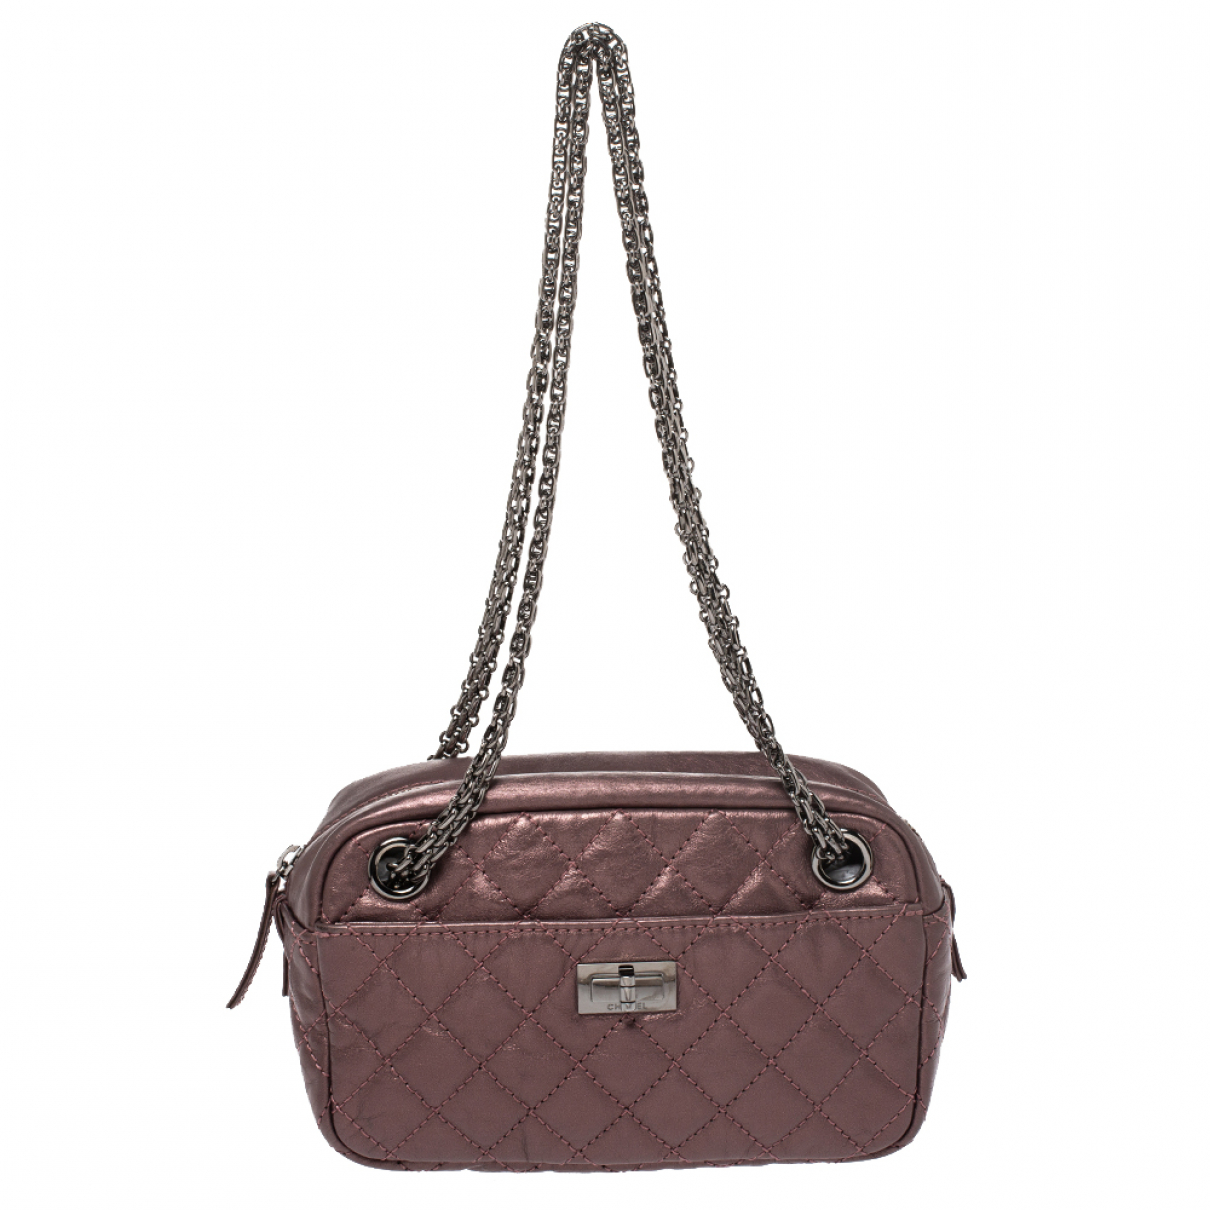 Chanel \N Metallic Leather handbag for Women \N